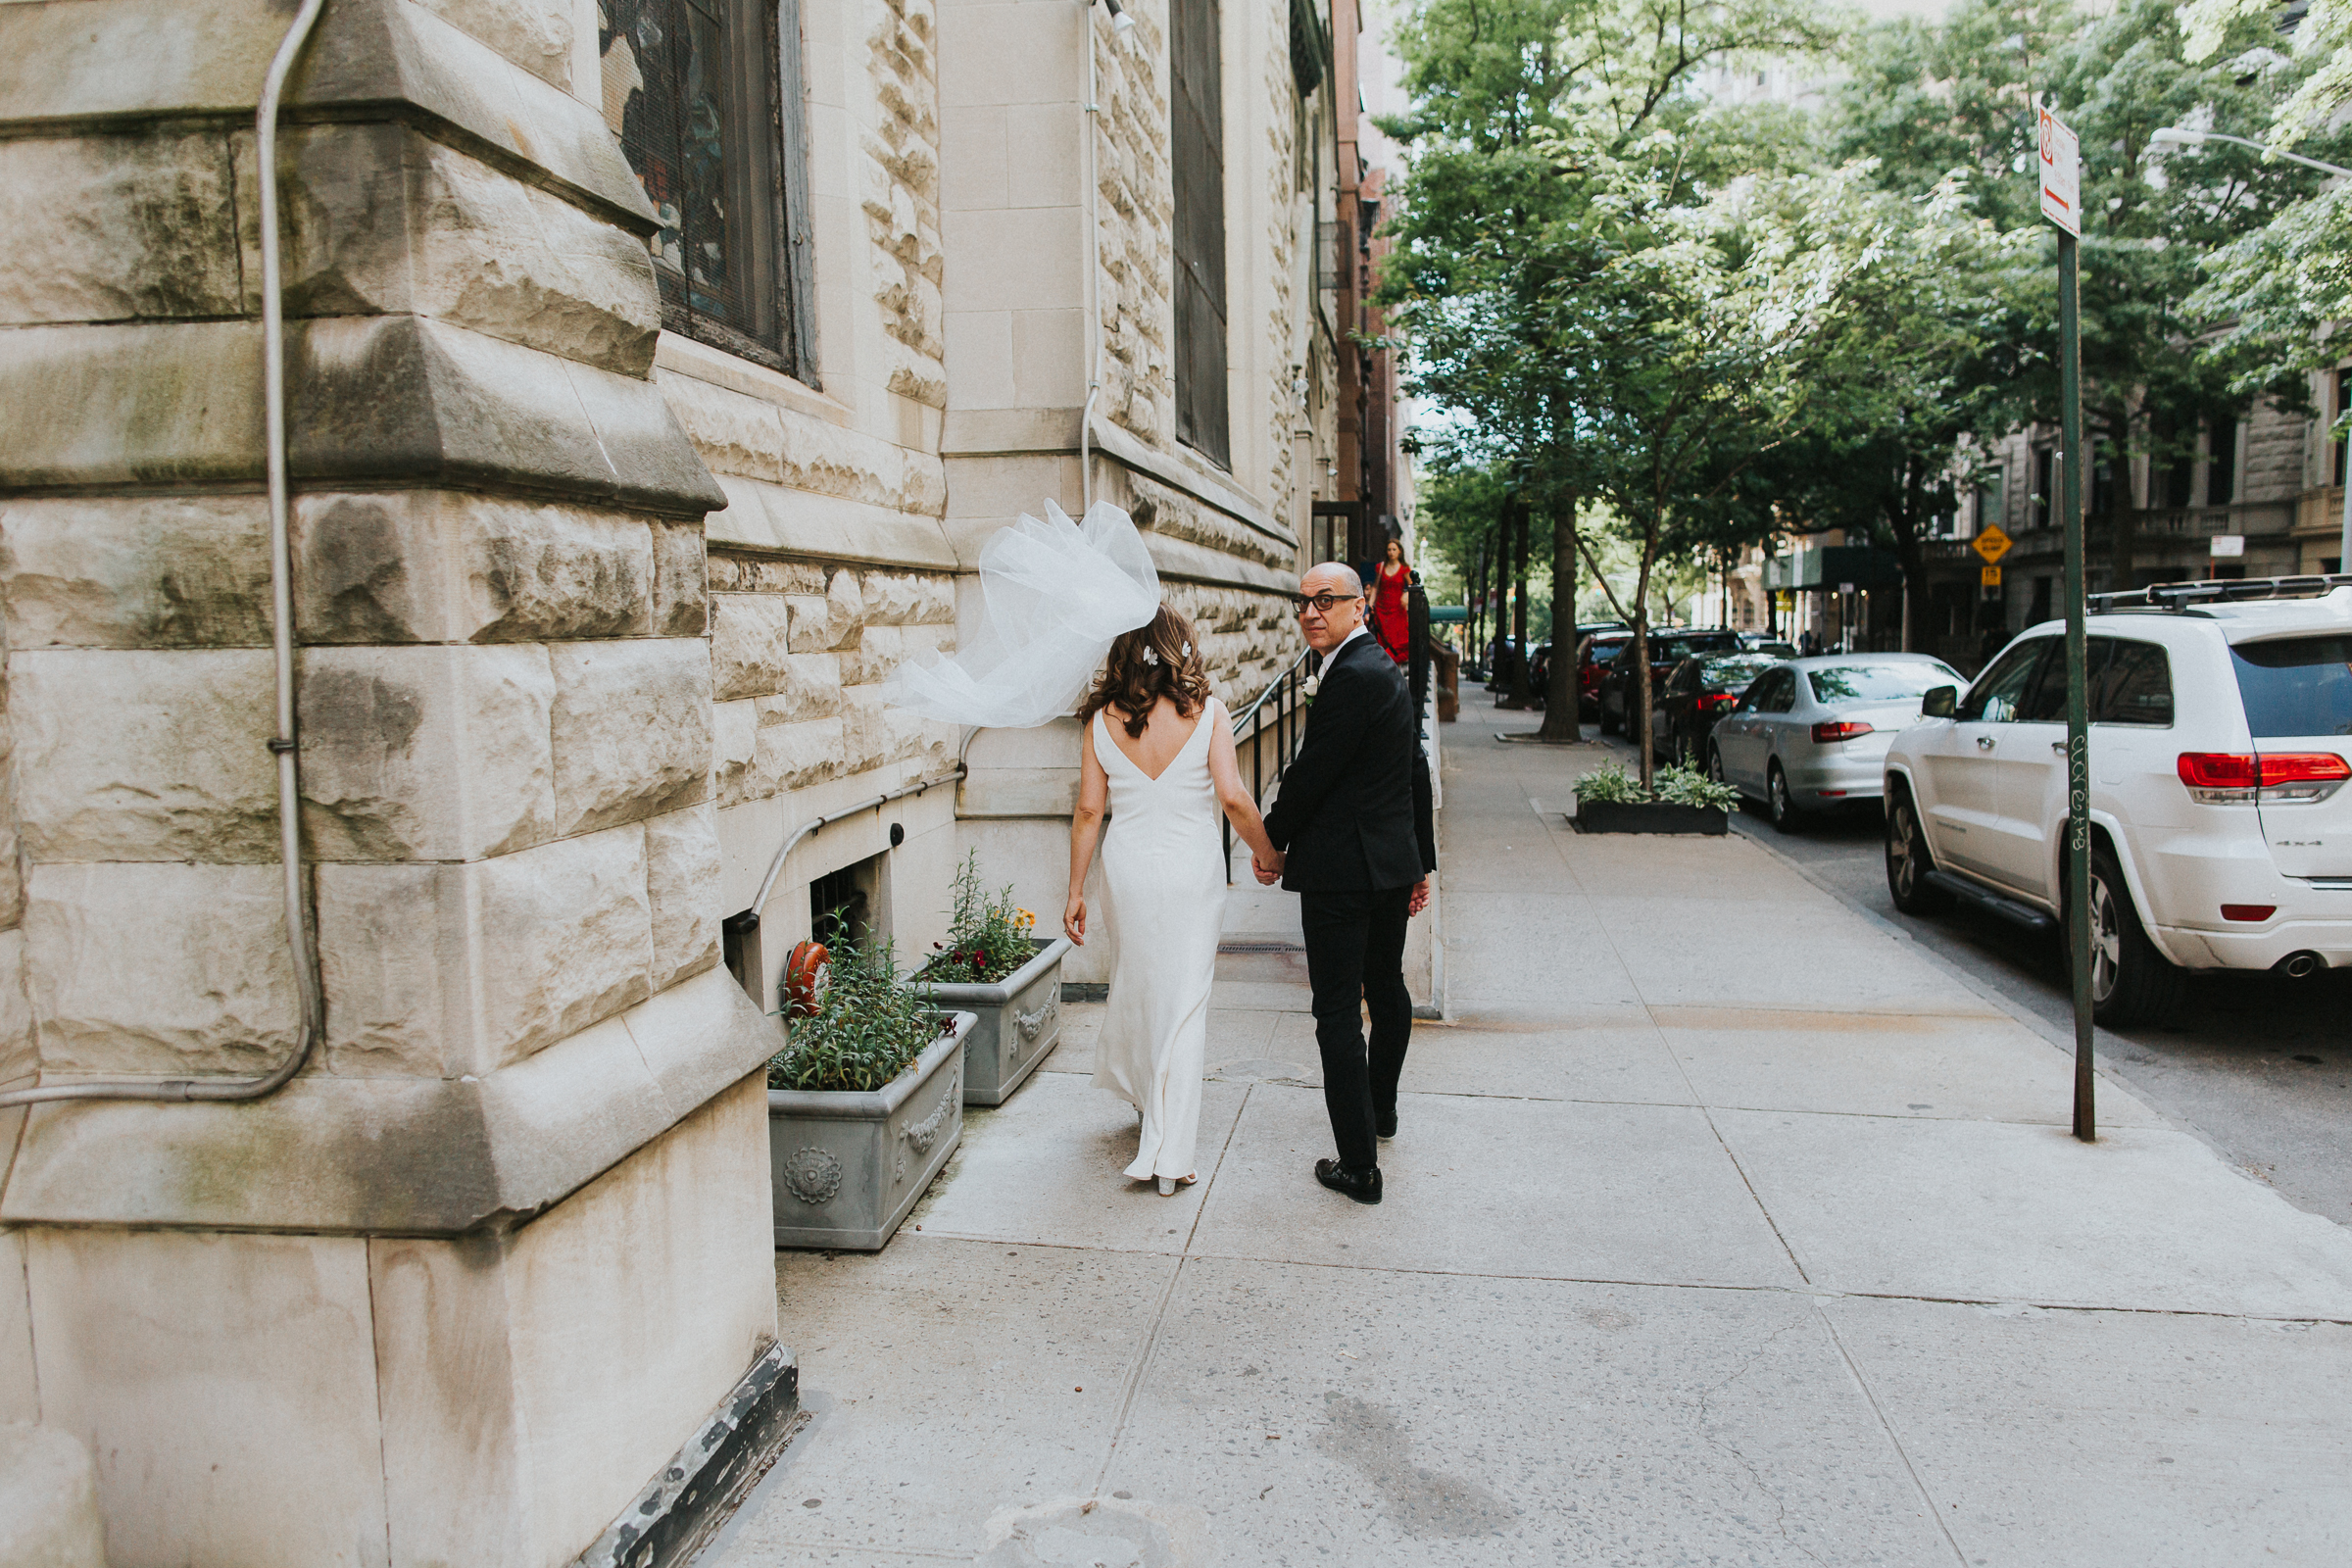 Robert-NYC-Museum-Of-Arts-&-Design-Greek-Italian-New-York-Documentary-Wedding-Photographer-22.jpg